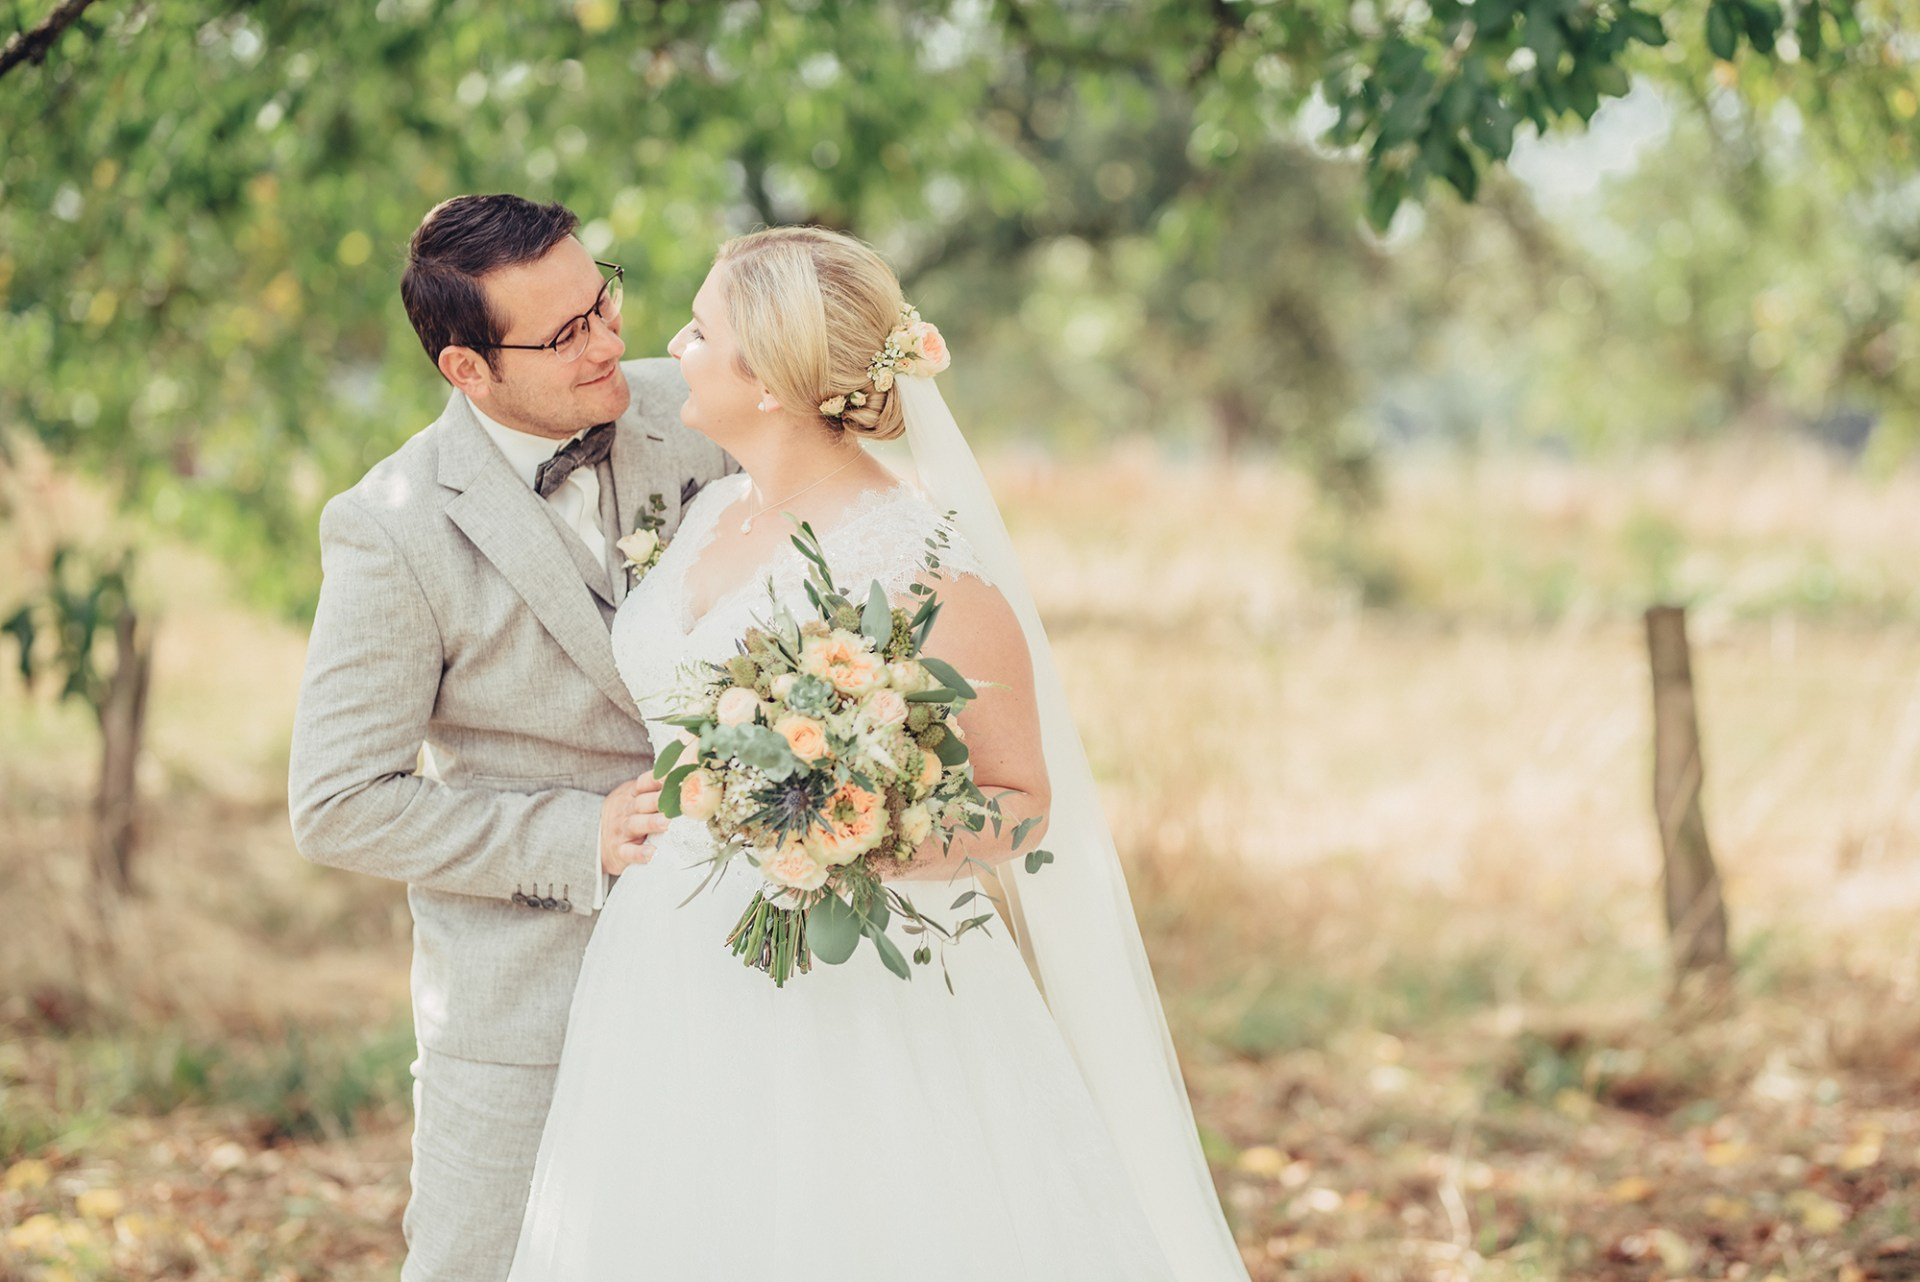 weddingseptemberluminoxx92348234149